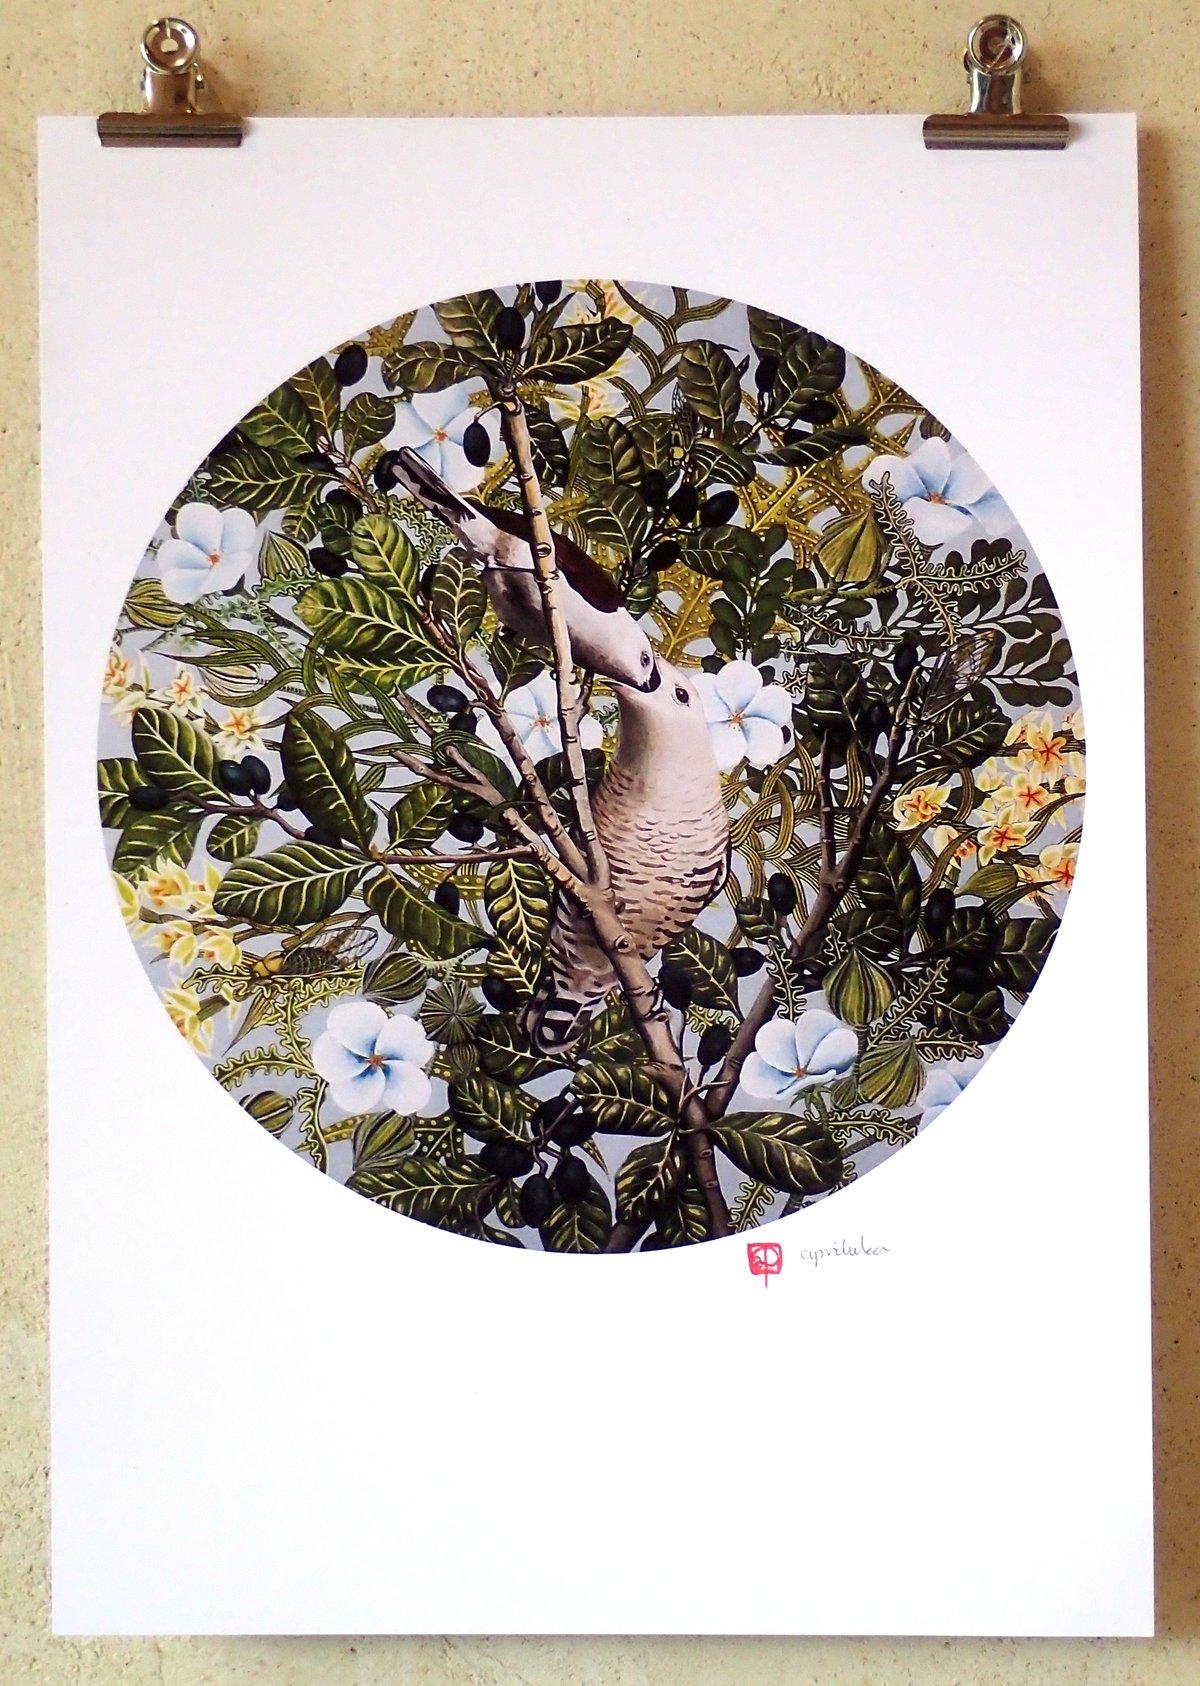 'Shining Cuckoo' A3 Print